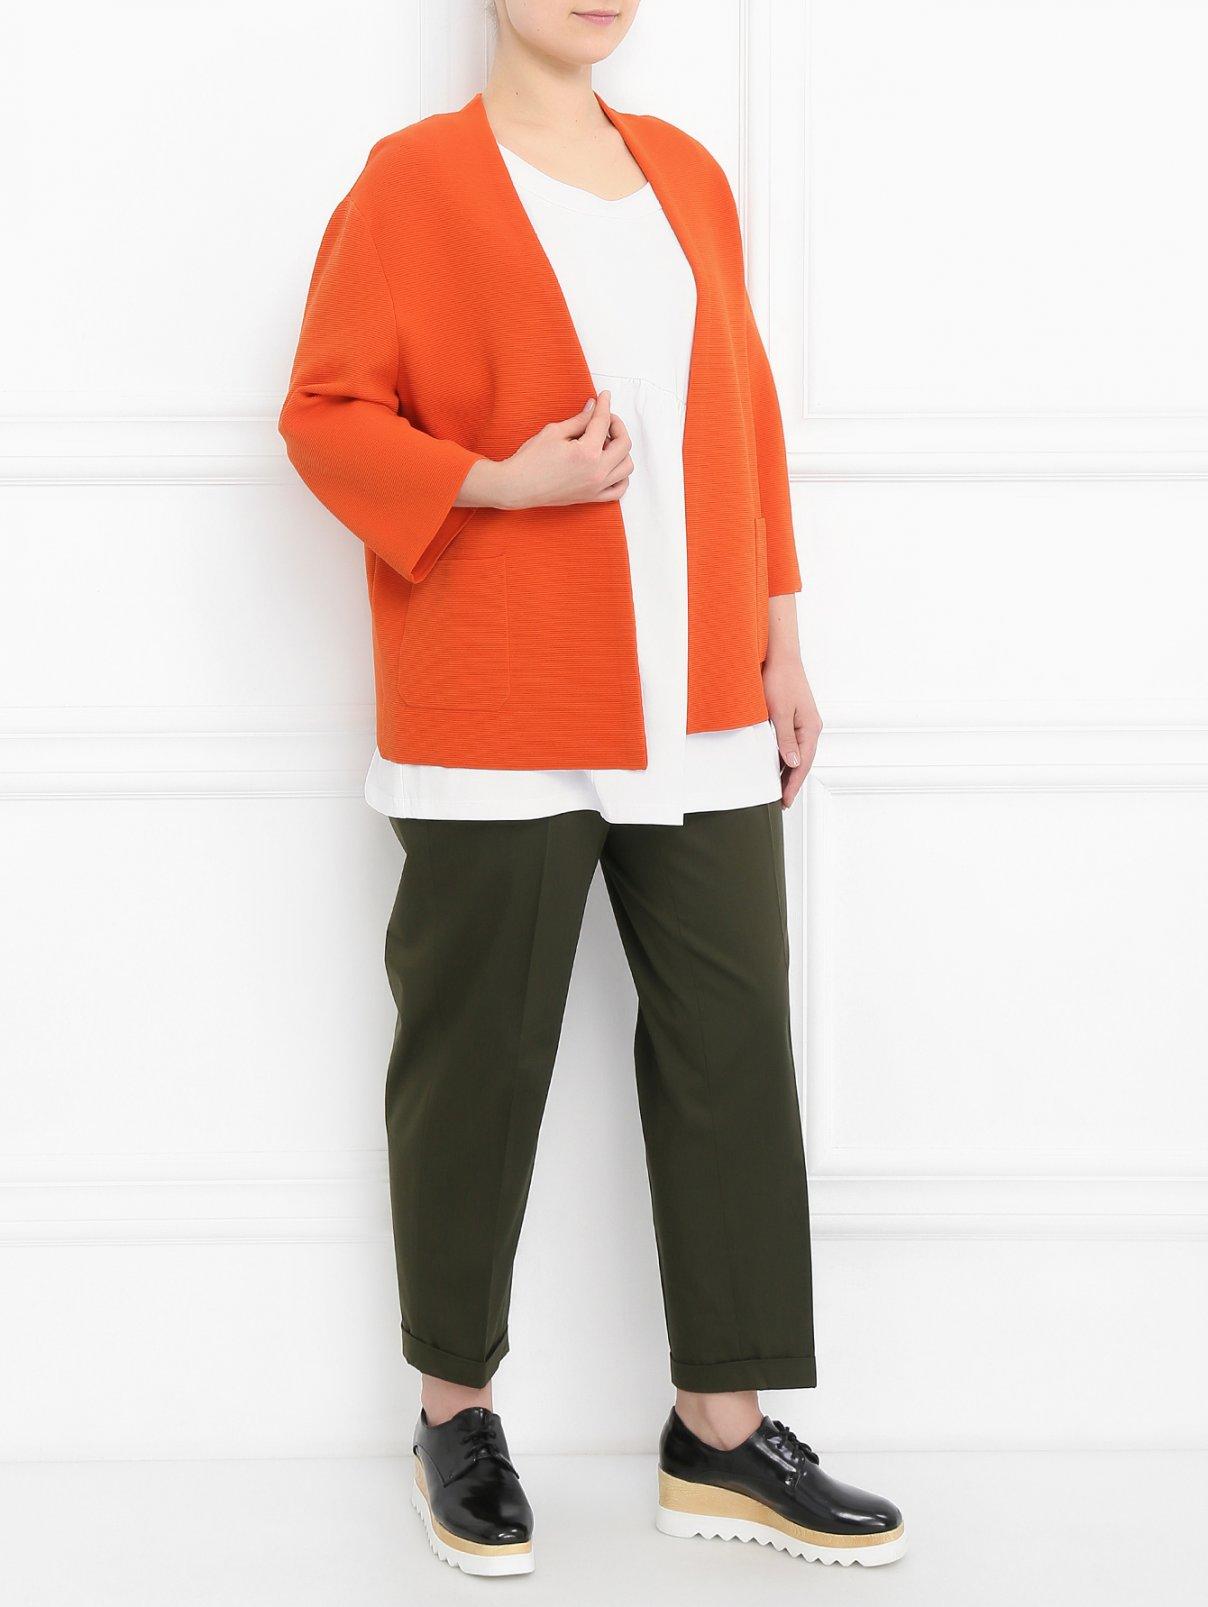 Кардиган с накладными карманами Marina Rinaldi  –  Модель Общий вид